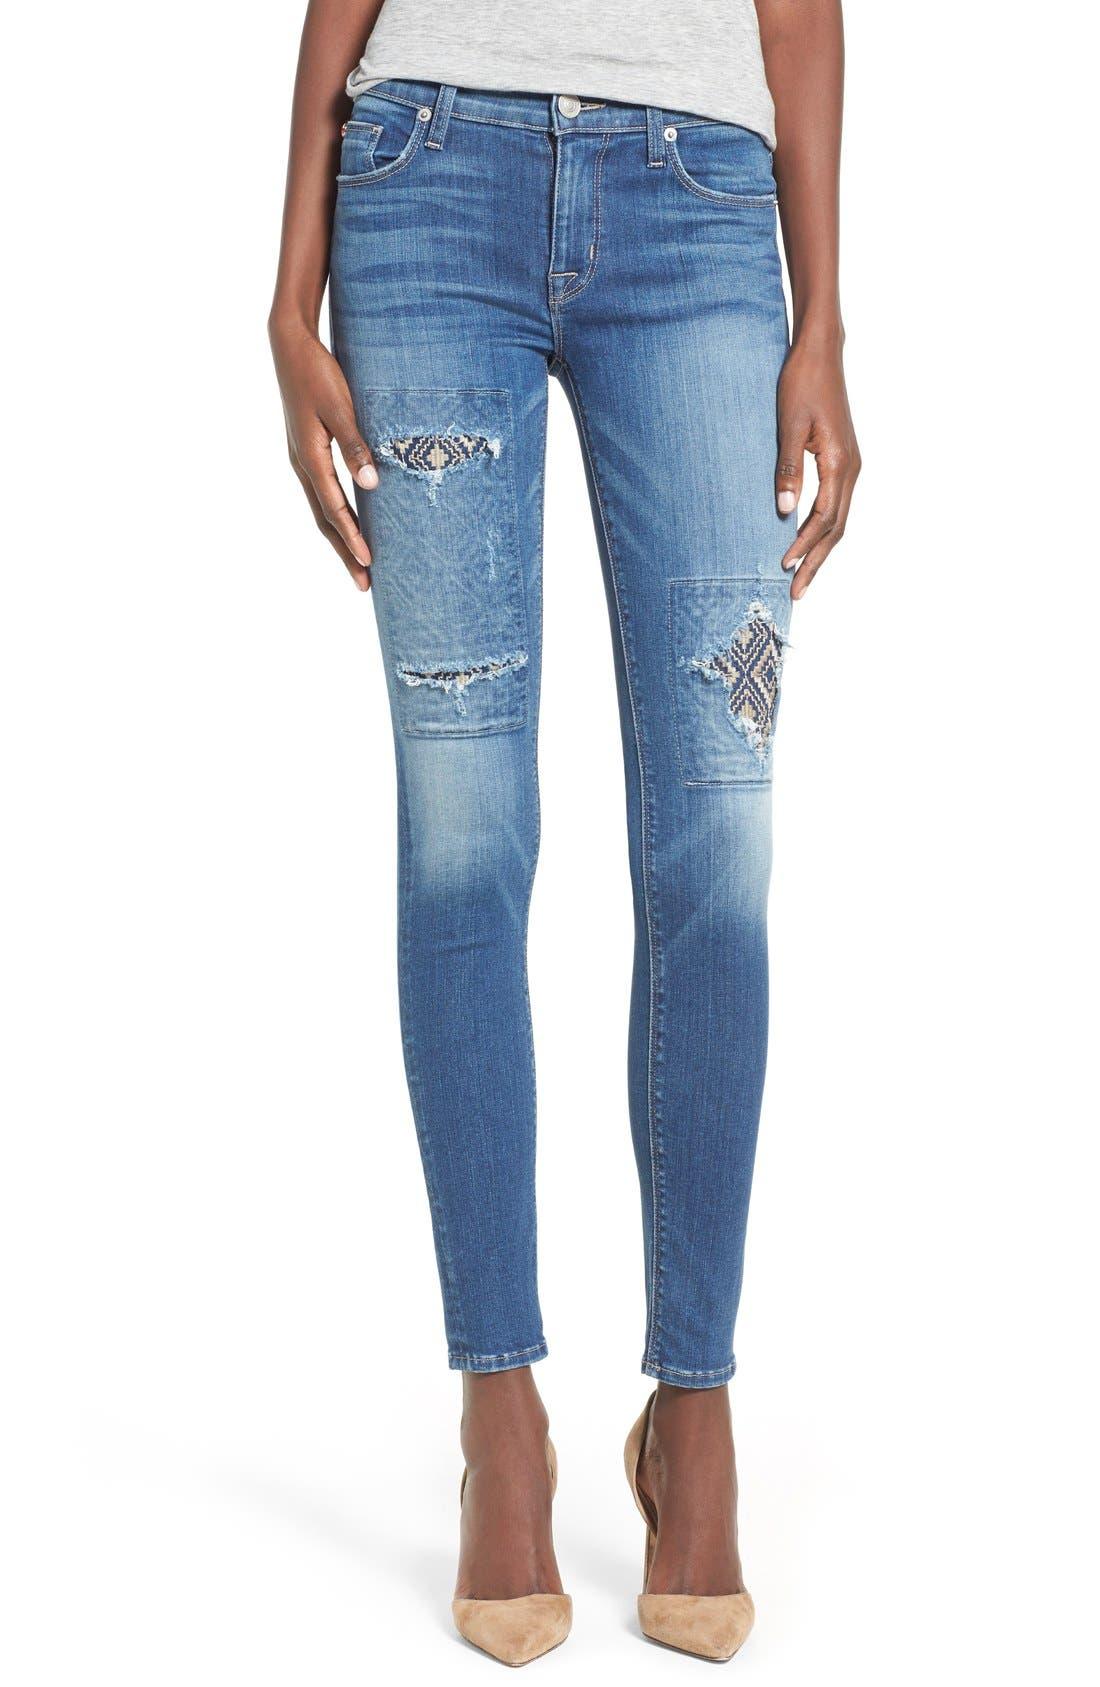 Main Image - Hudson Jeans 'Nico' Super Skinny Jeans